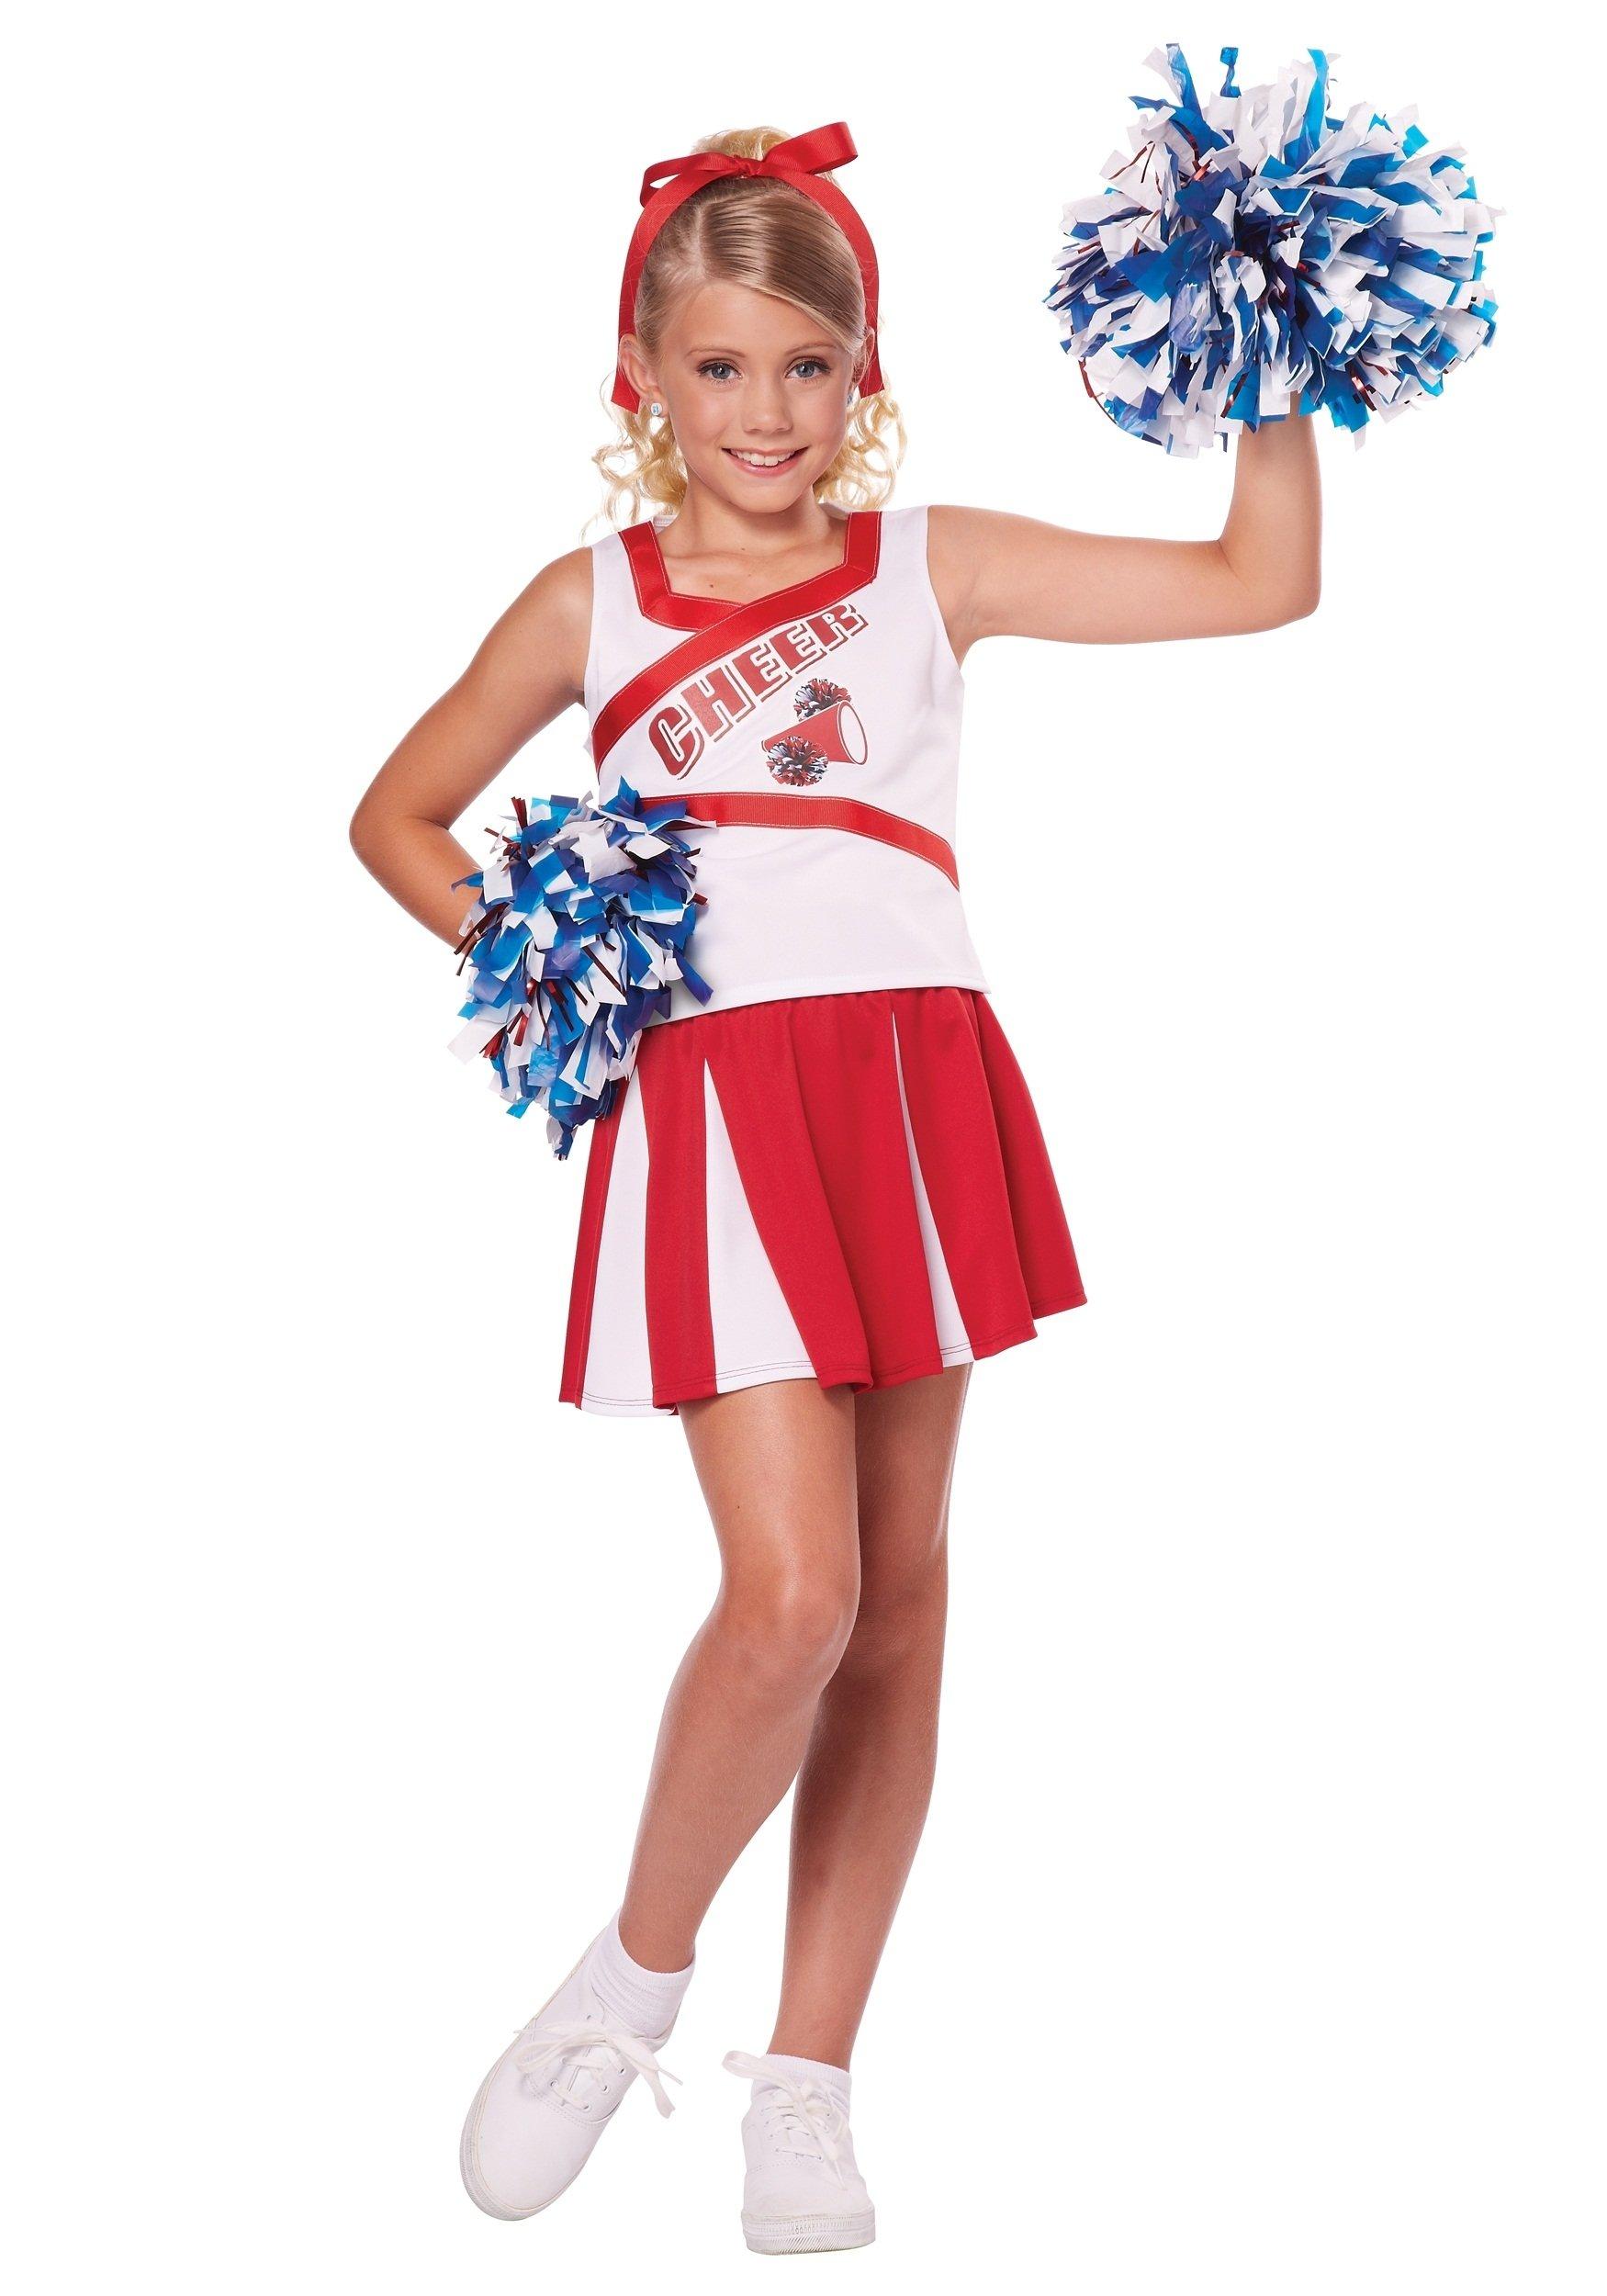 10 Ideal High School Halloween Costume Ideas child high school cheerleader costume 2021